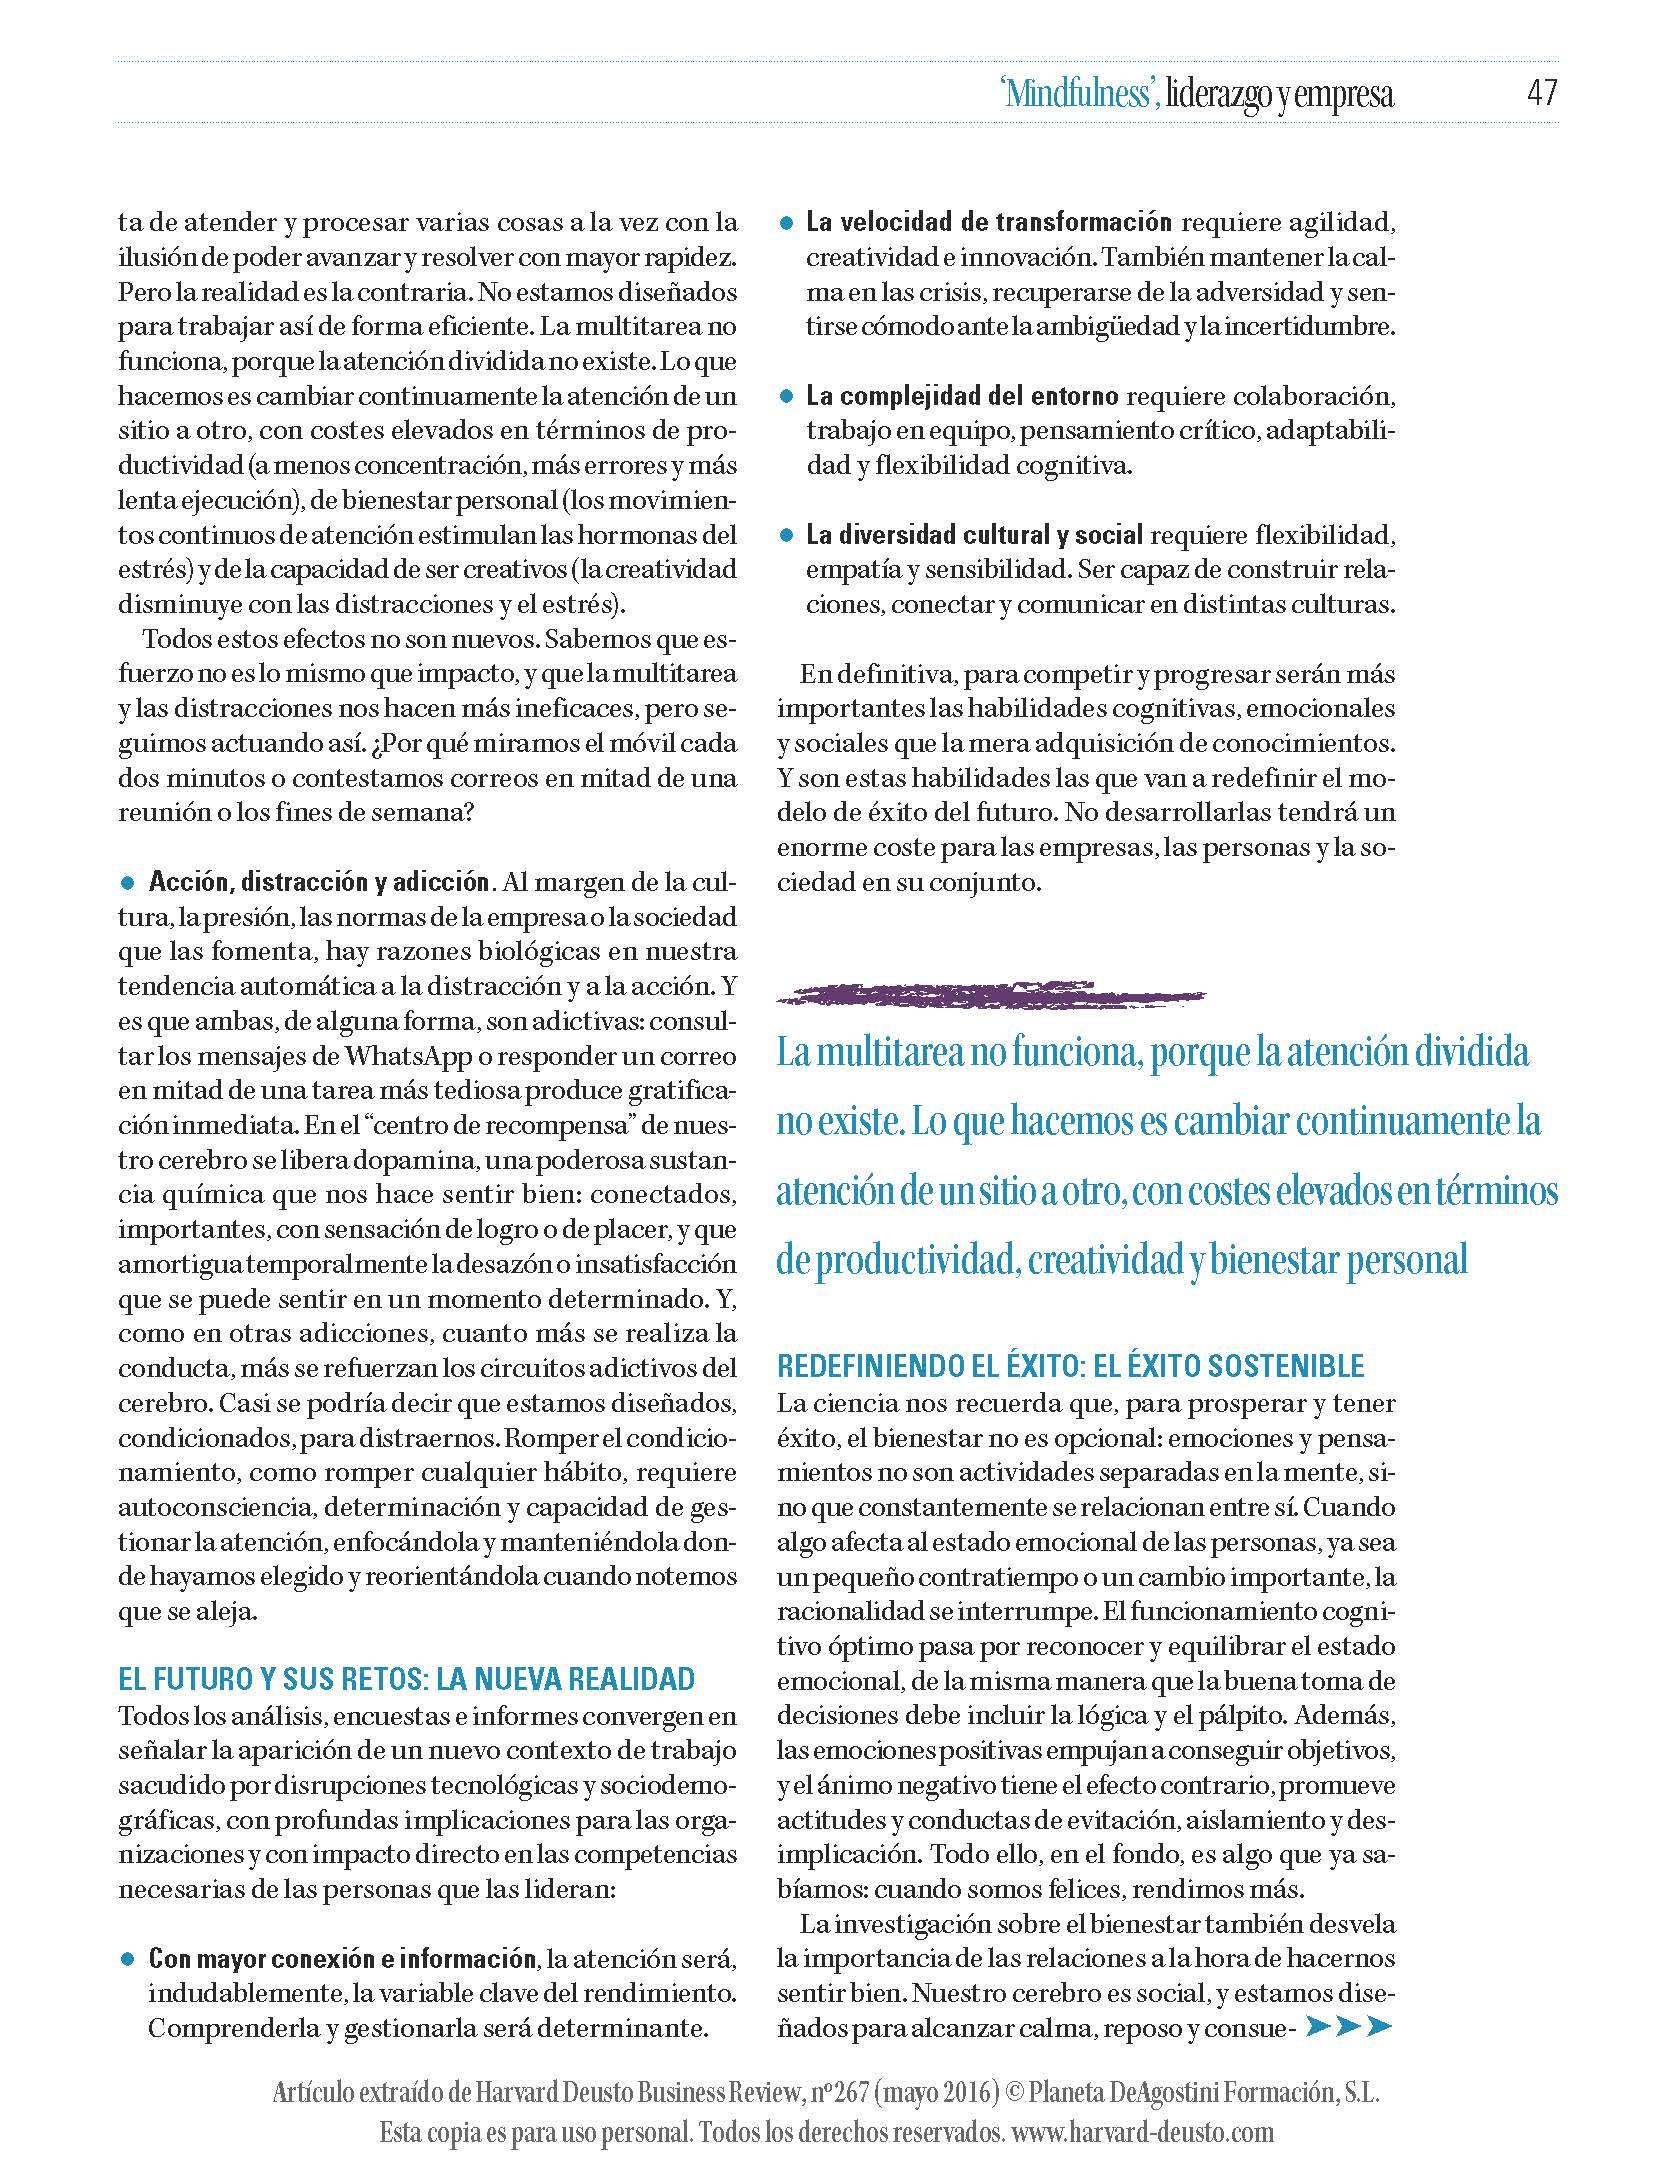 mindfulness y empresas. HBR. Estrella (2017)_Página_4.jpg